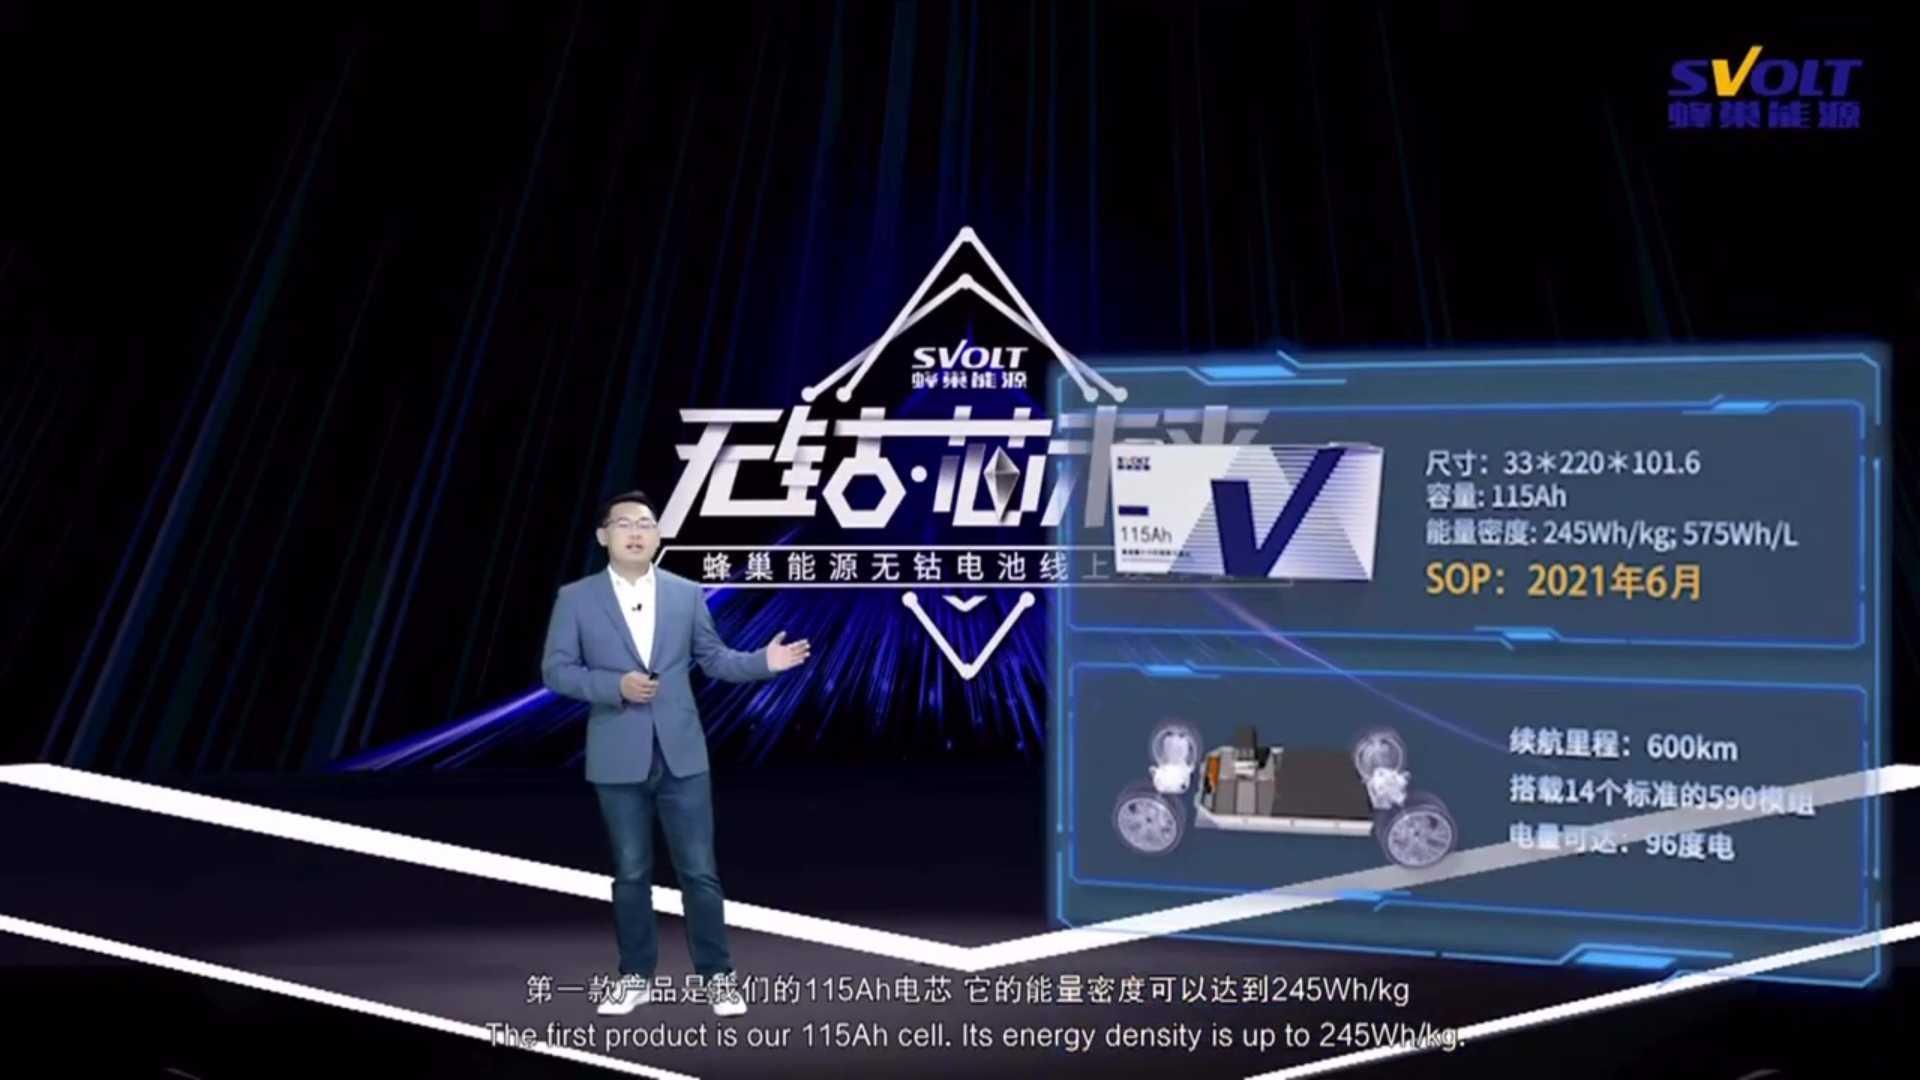 tesla-battery-day-svolt-announces-cobalt-free-li-ion-battery-production